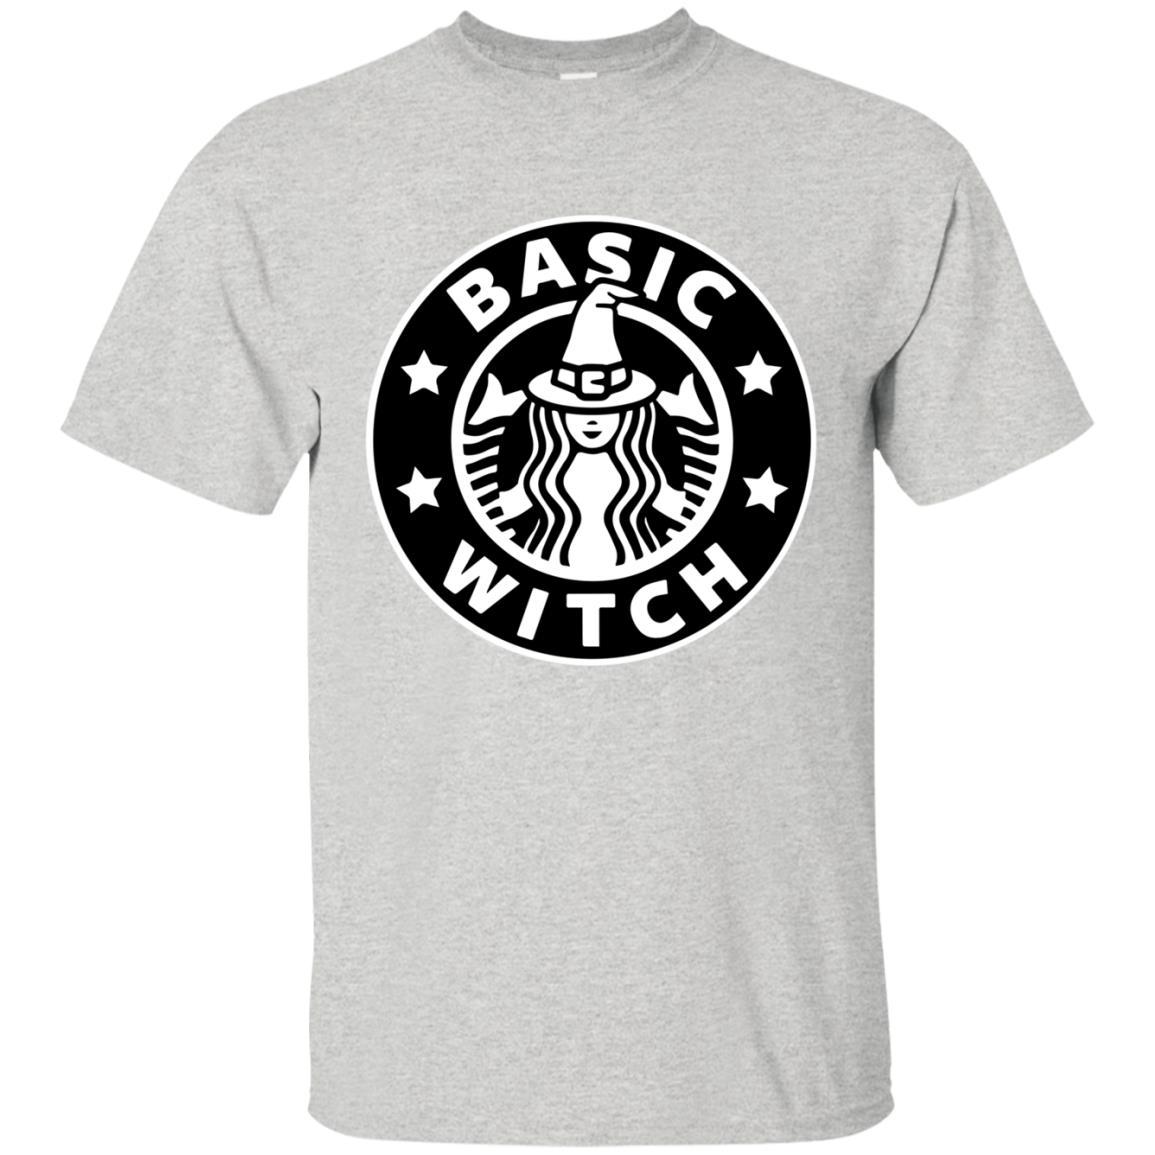 image 1014 - Basic Witch Shirt, Halloween Starbuck parody